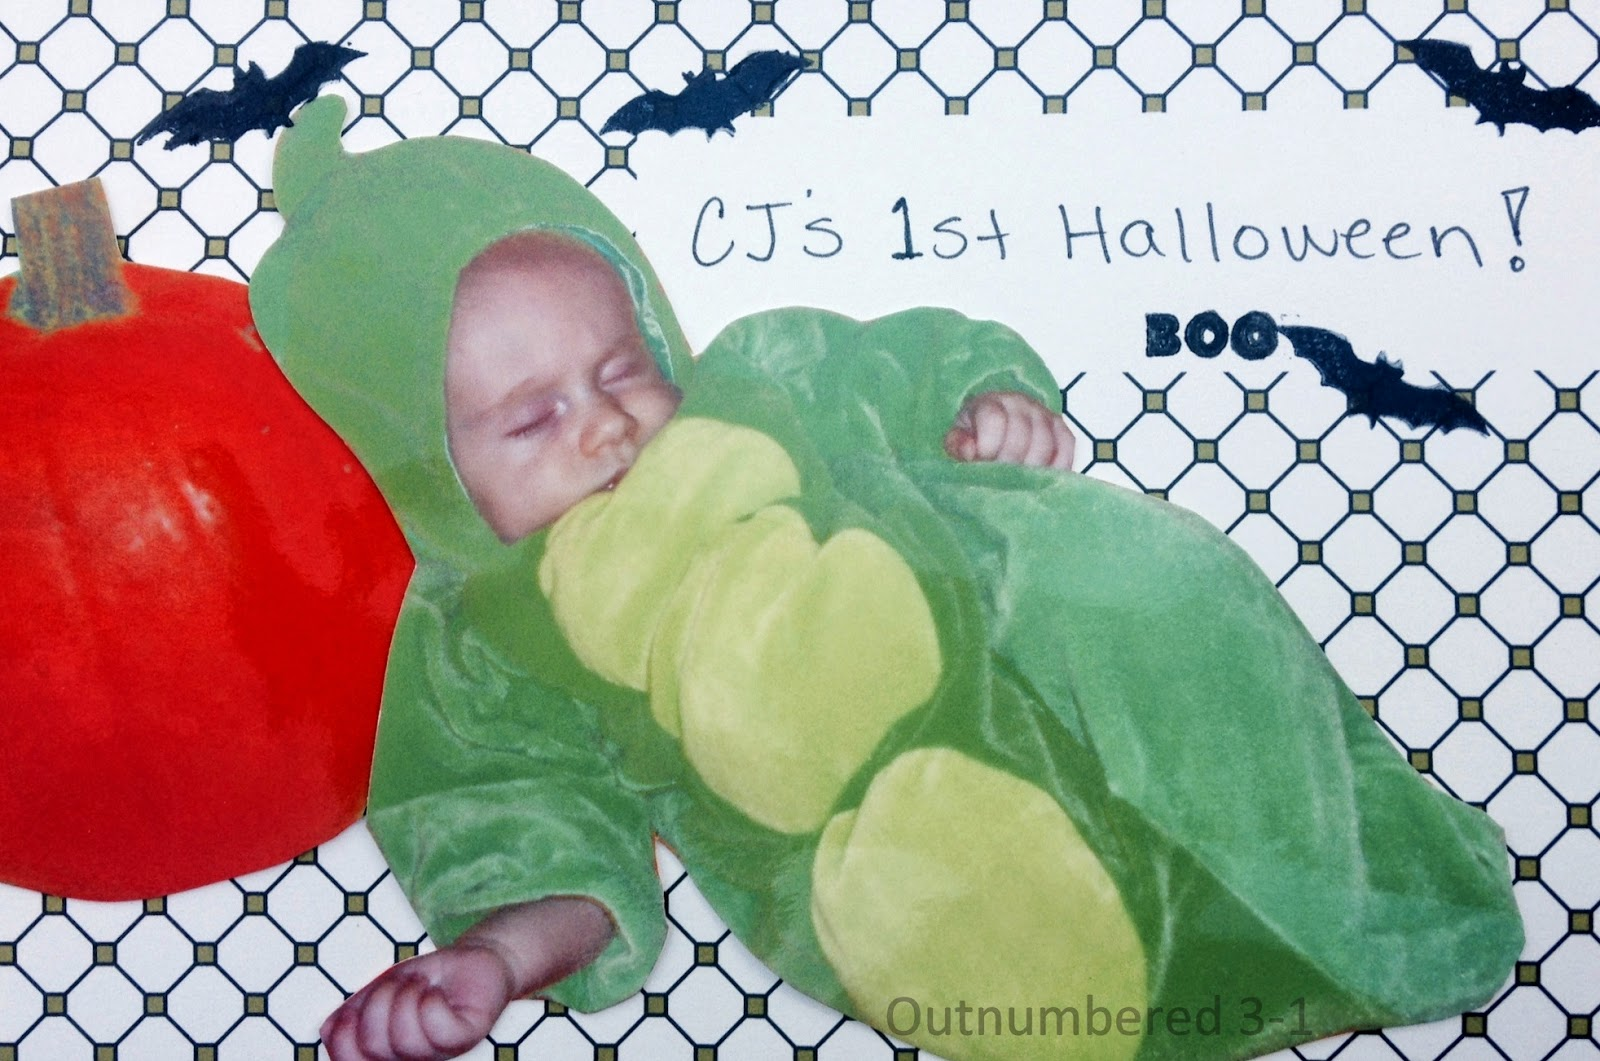 Holiday Memories, Stampin' Up!, Scrapbooking, Stamps, Halloween